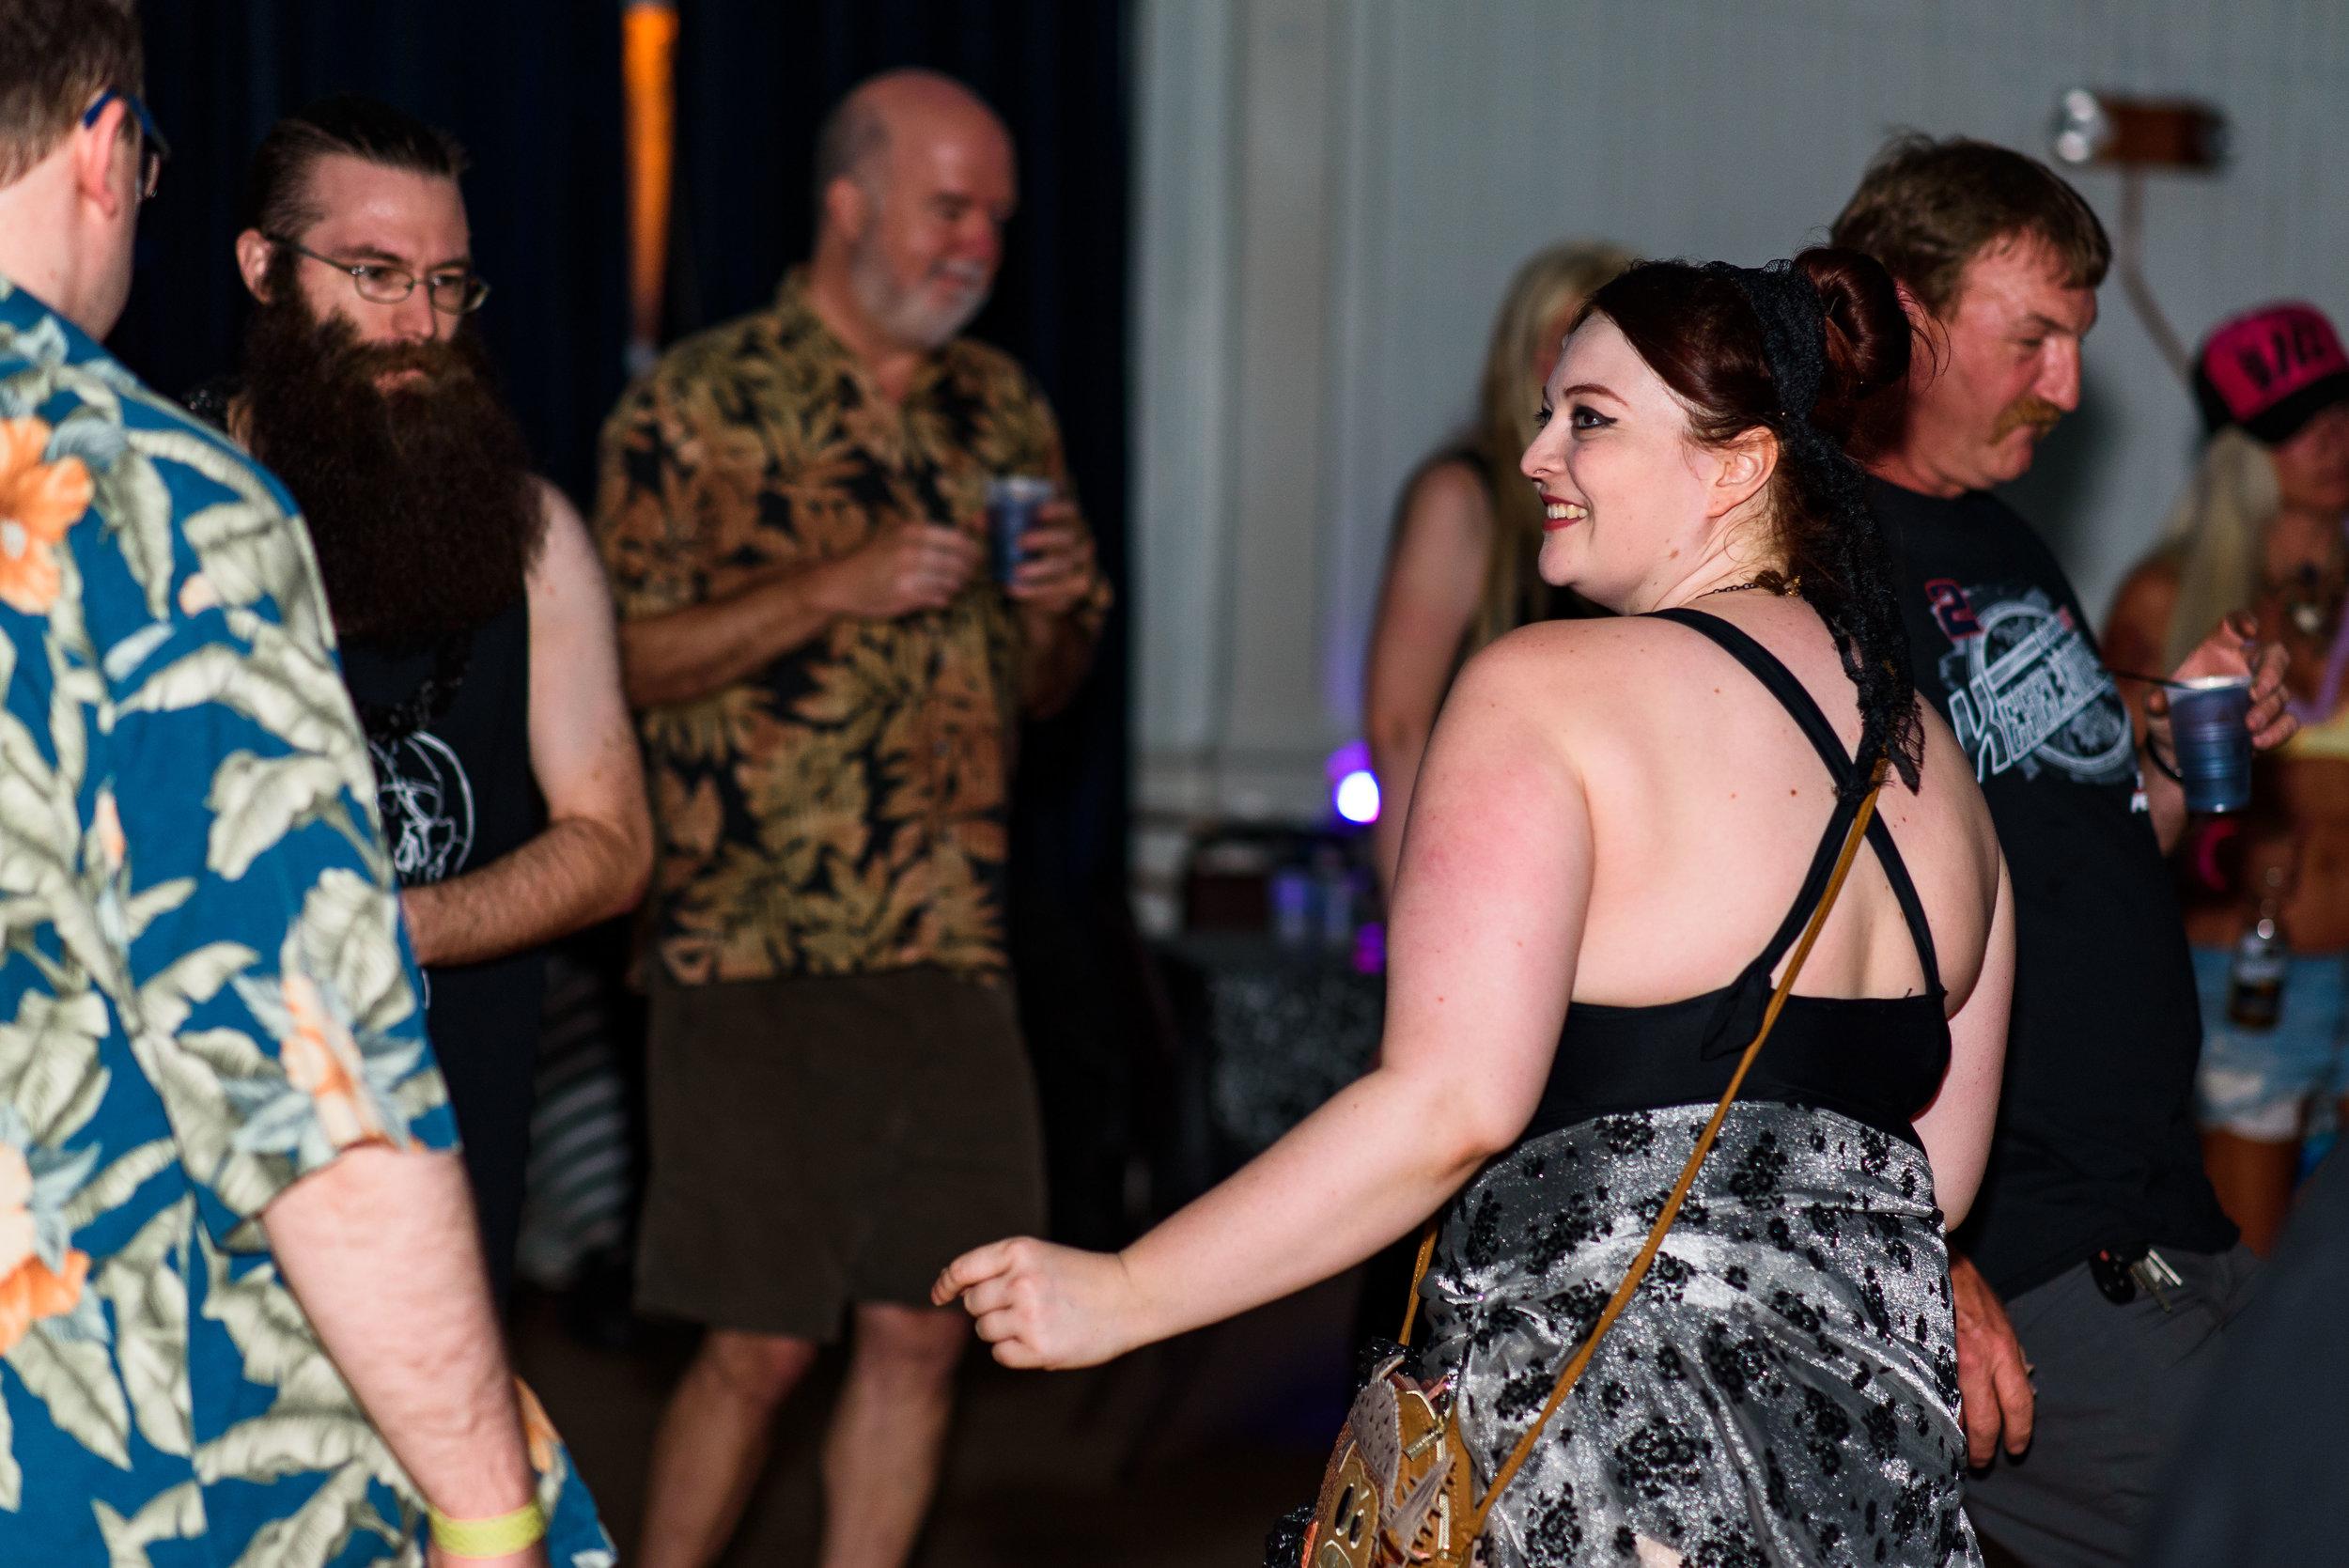 2019-TheHaven Club - Beach Party (32).jpg